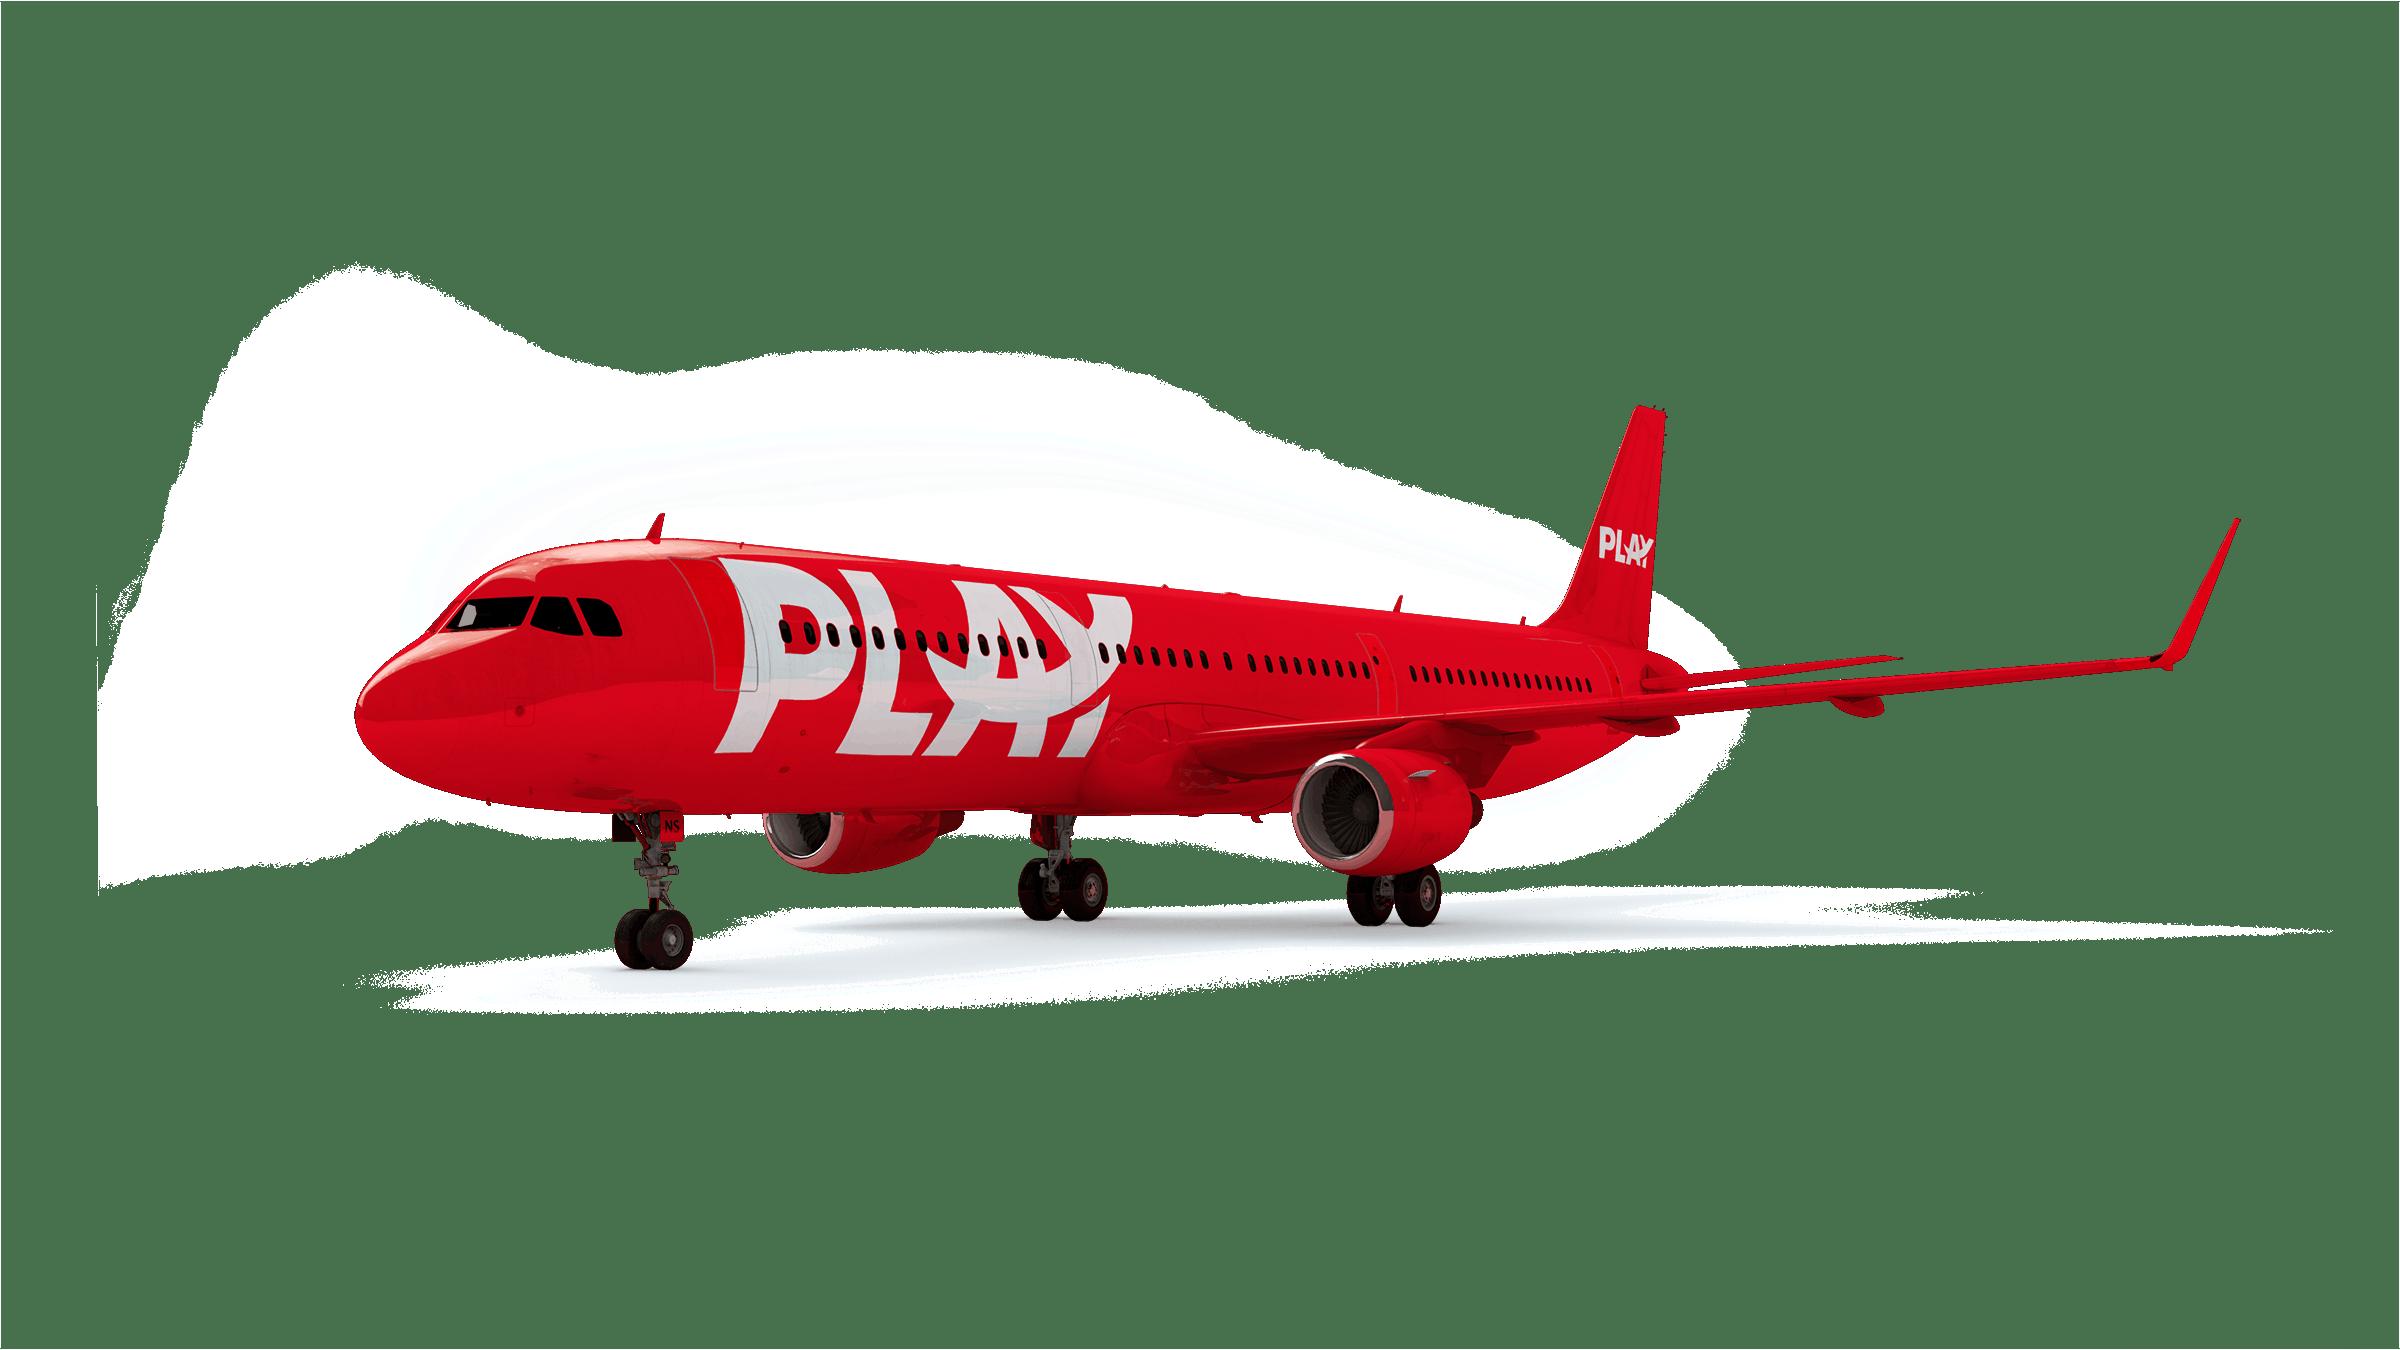 Fly Play - Resesidan.se